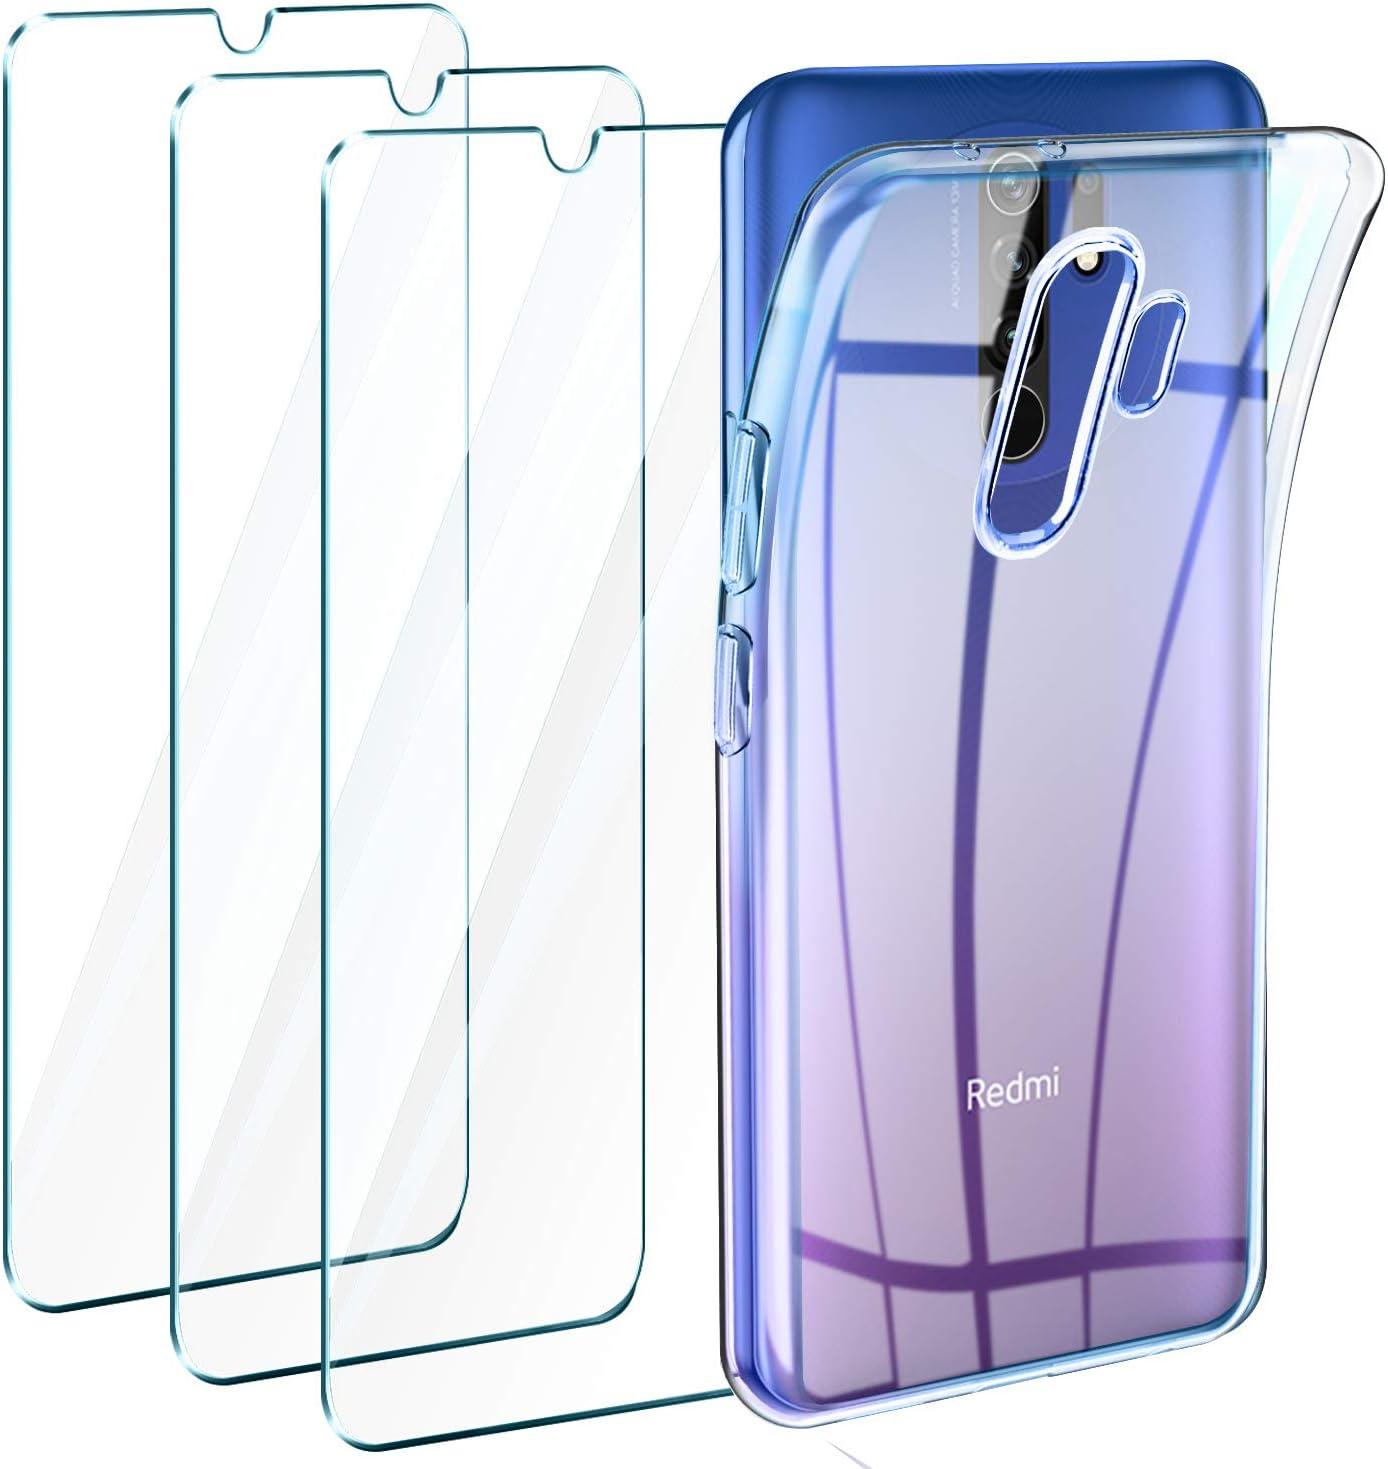 Leathlux Funda Xiaomi Redmi 9 + 3 x Protector de Pantalla Xiaomi Redmi 9, Transparente TPU Silicona Funda + Cristal Vidrio Templado Protector de Pantalla y Carcasa Xiaomi Redmi 9 6.6